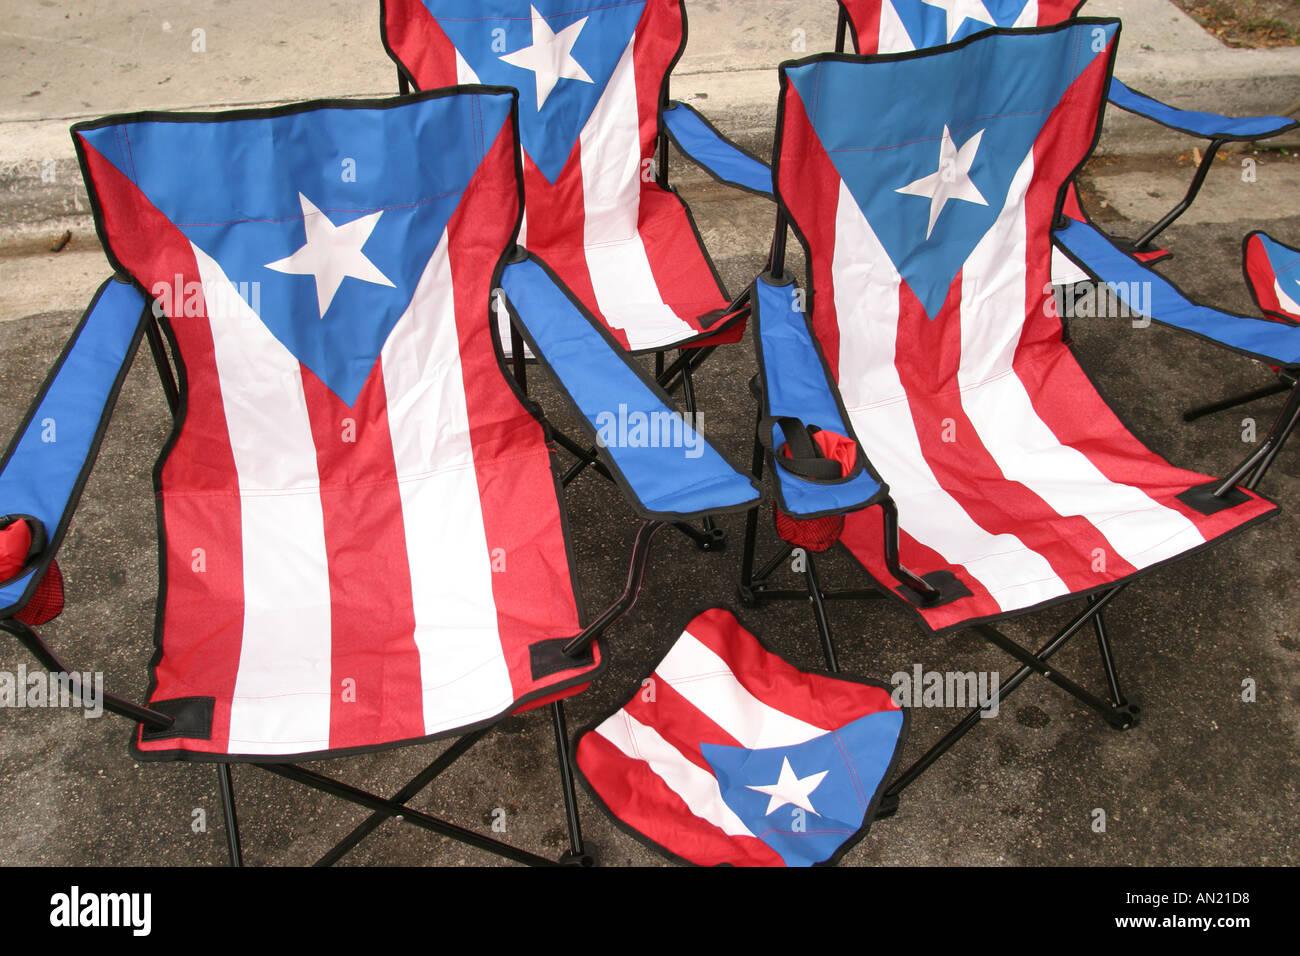 Miami Florida Little Havana Calle Ocho Festival Cuban Fair Folding Chairs  Puerto Rico Flag Theme